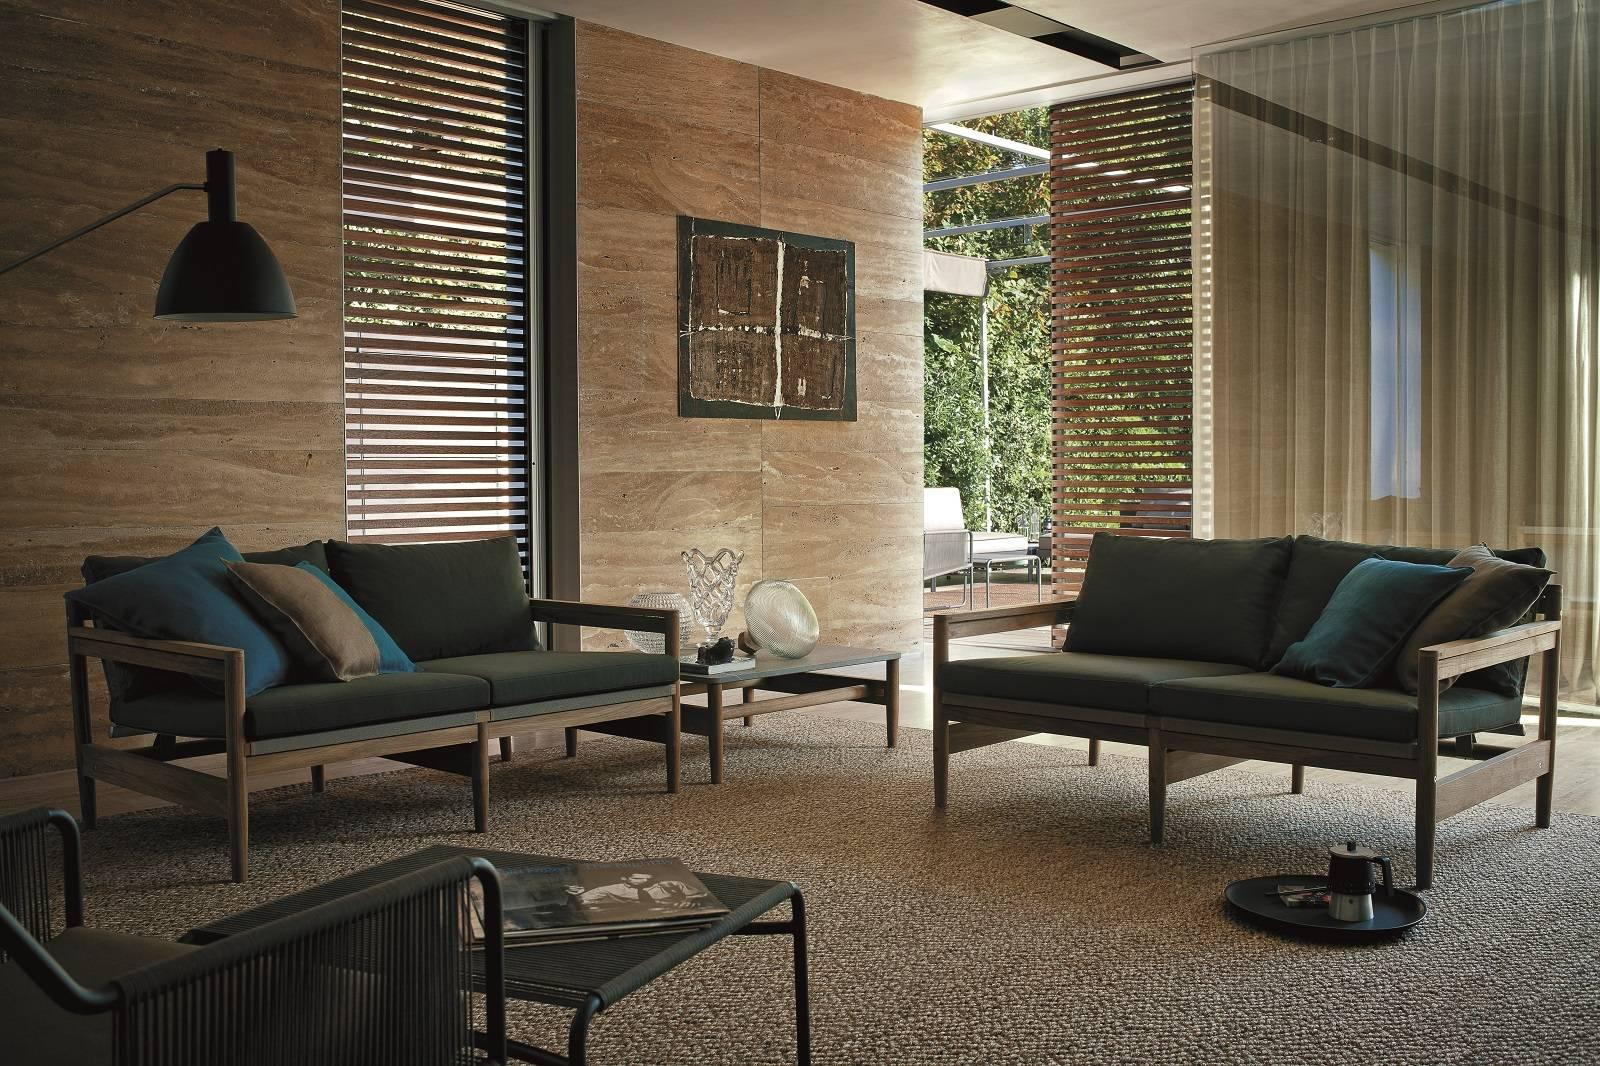 Roda Indoor/Outdoor Road 142 Sofa Designed By Rodolfo Dordoni For Sale At  1stdibs